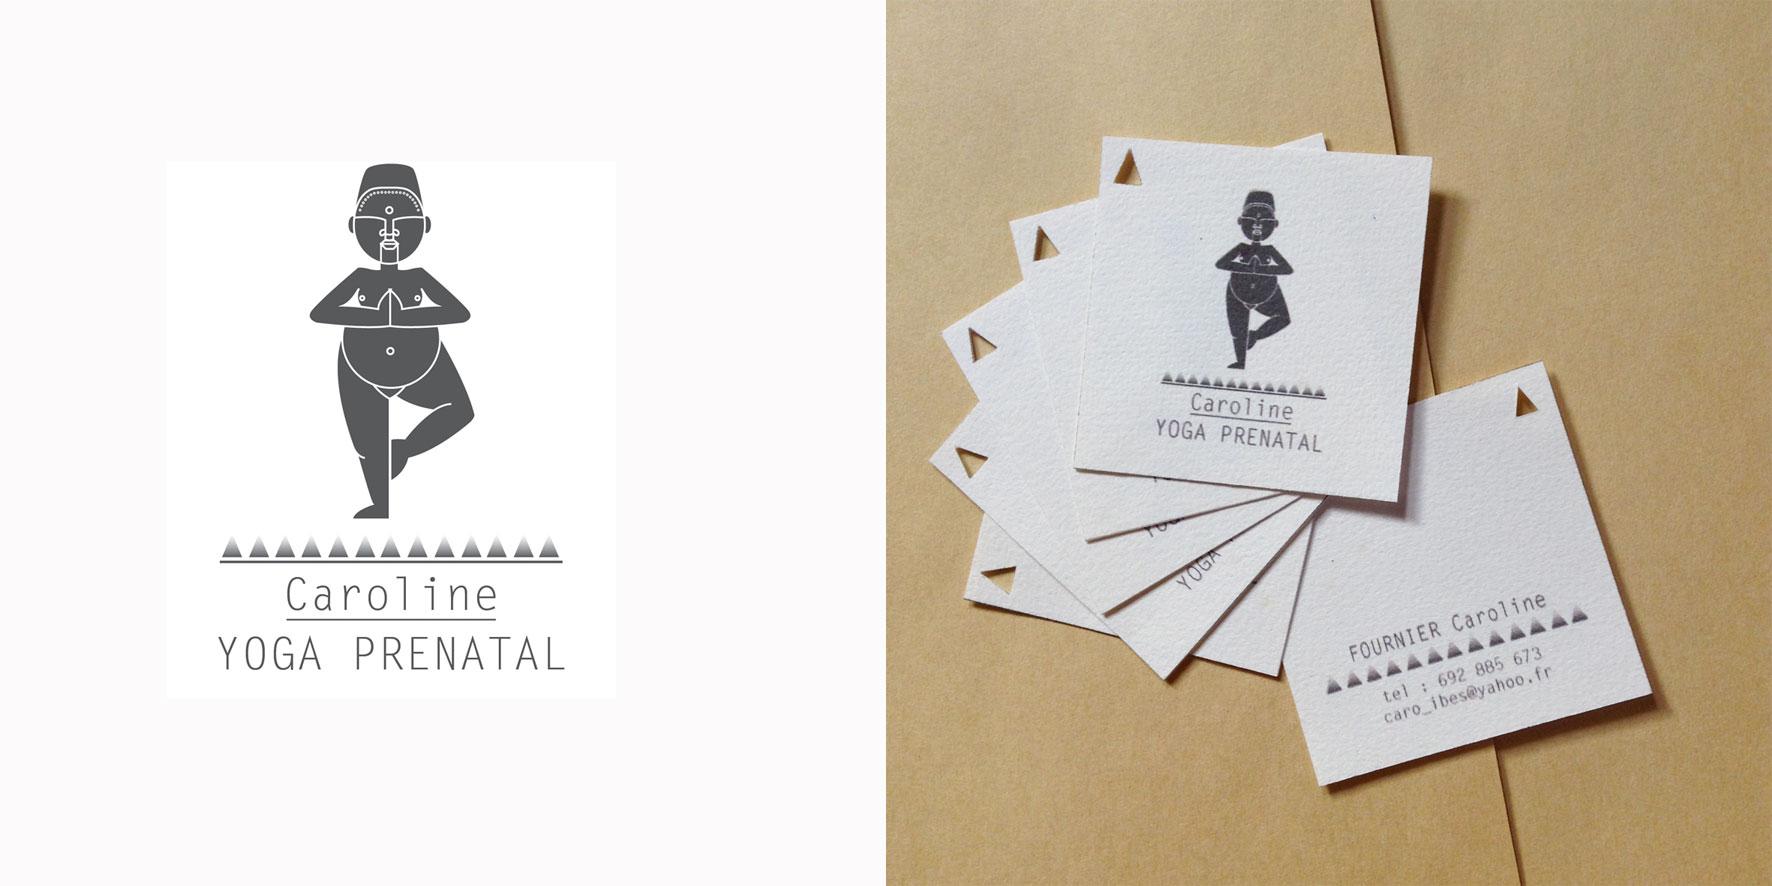 bySterenn - graphic design